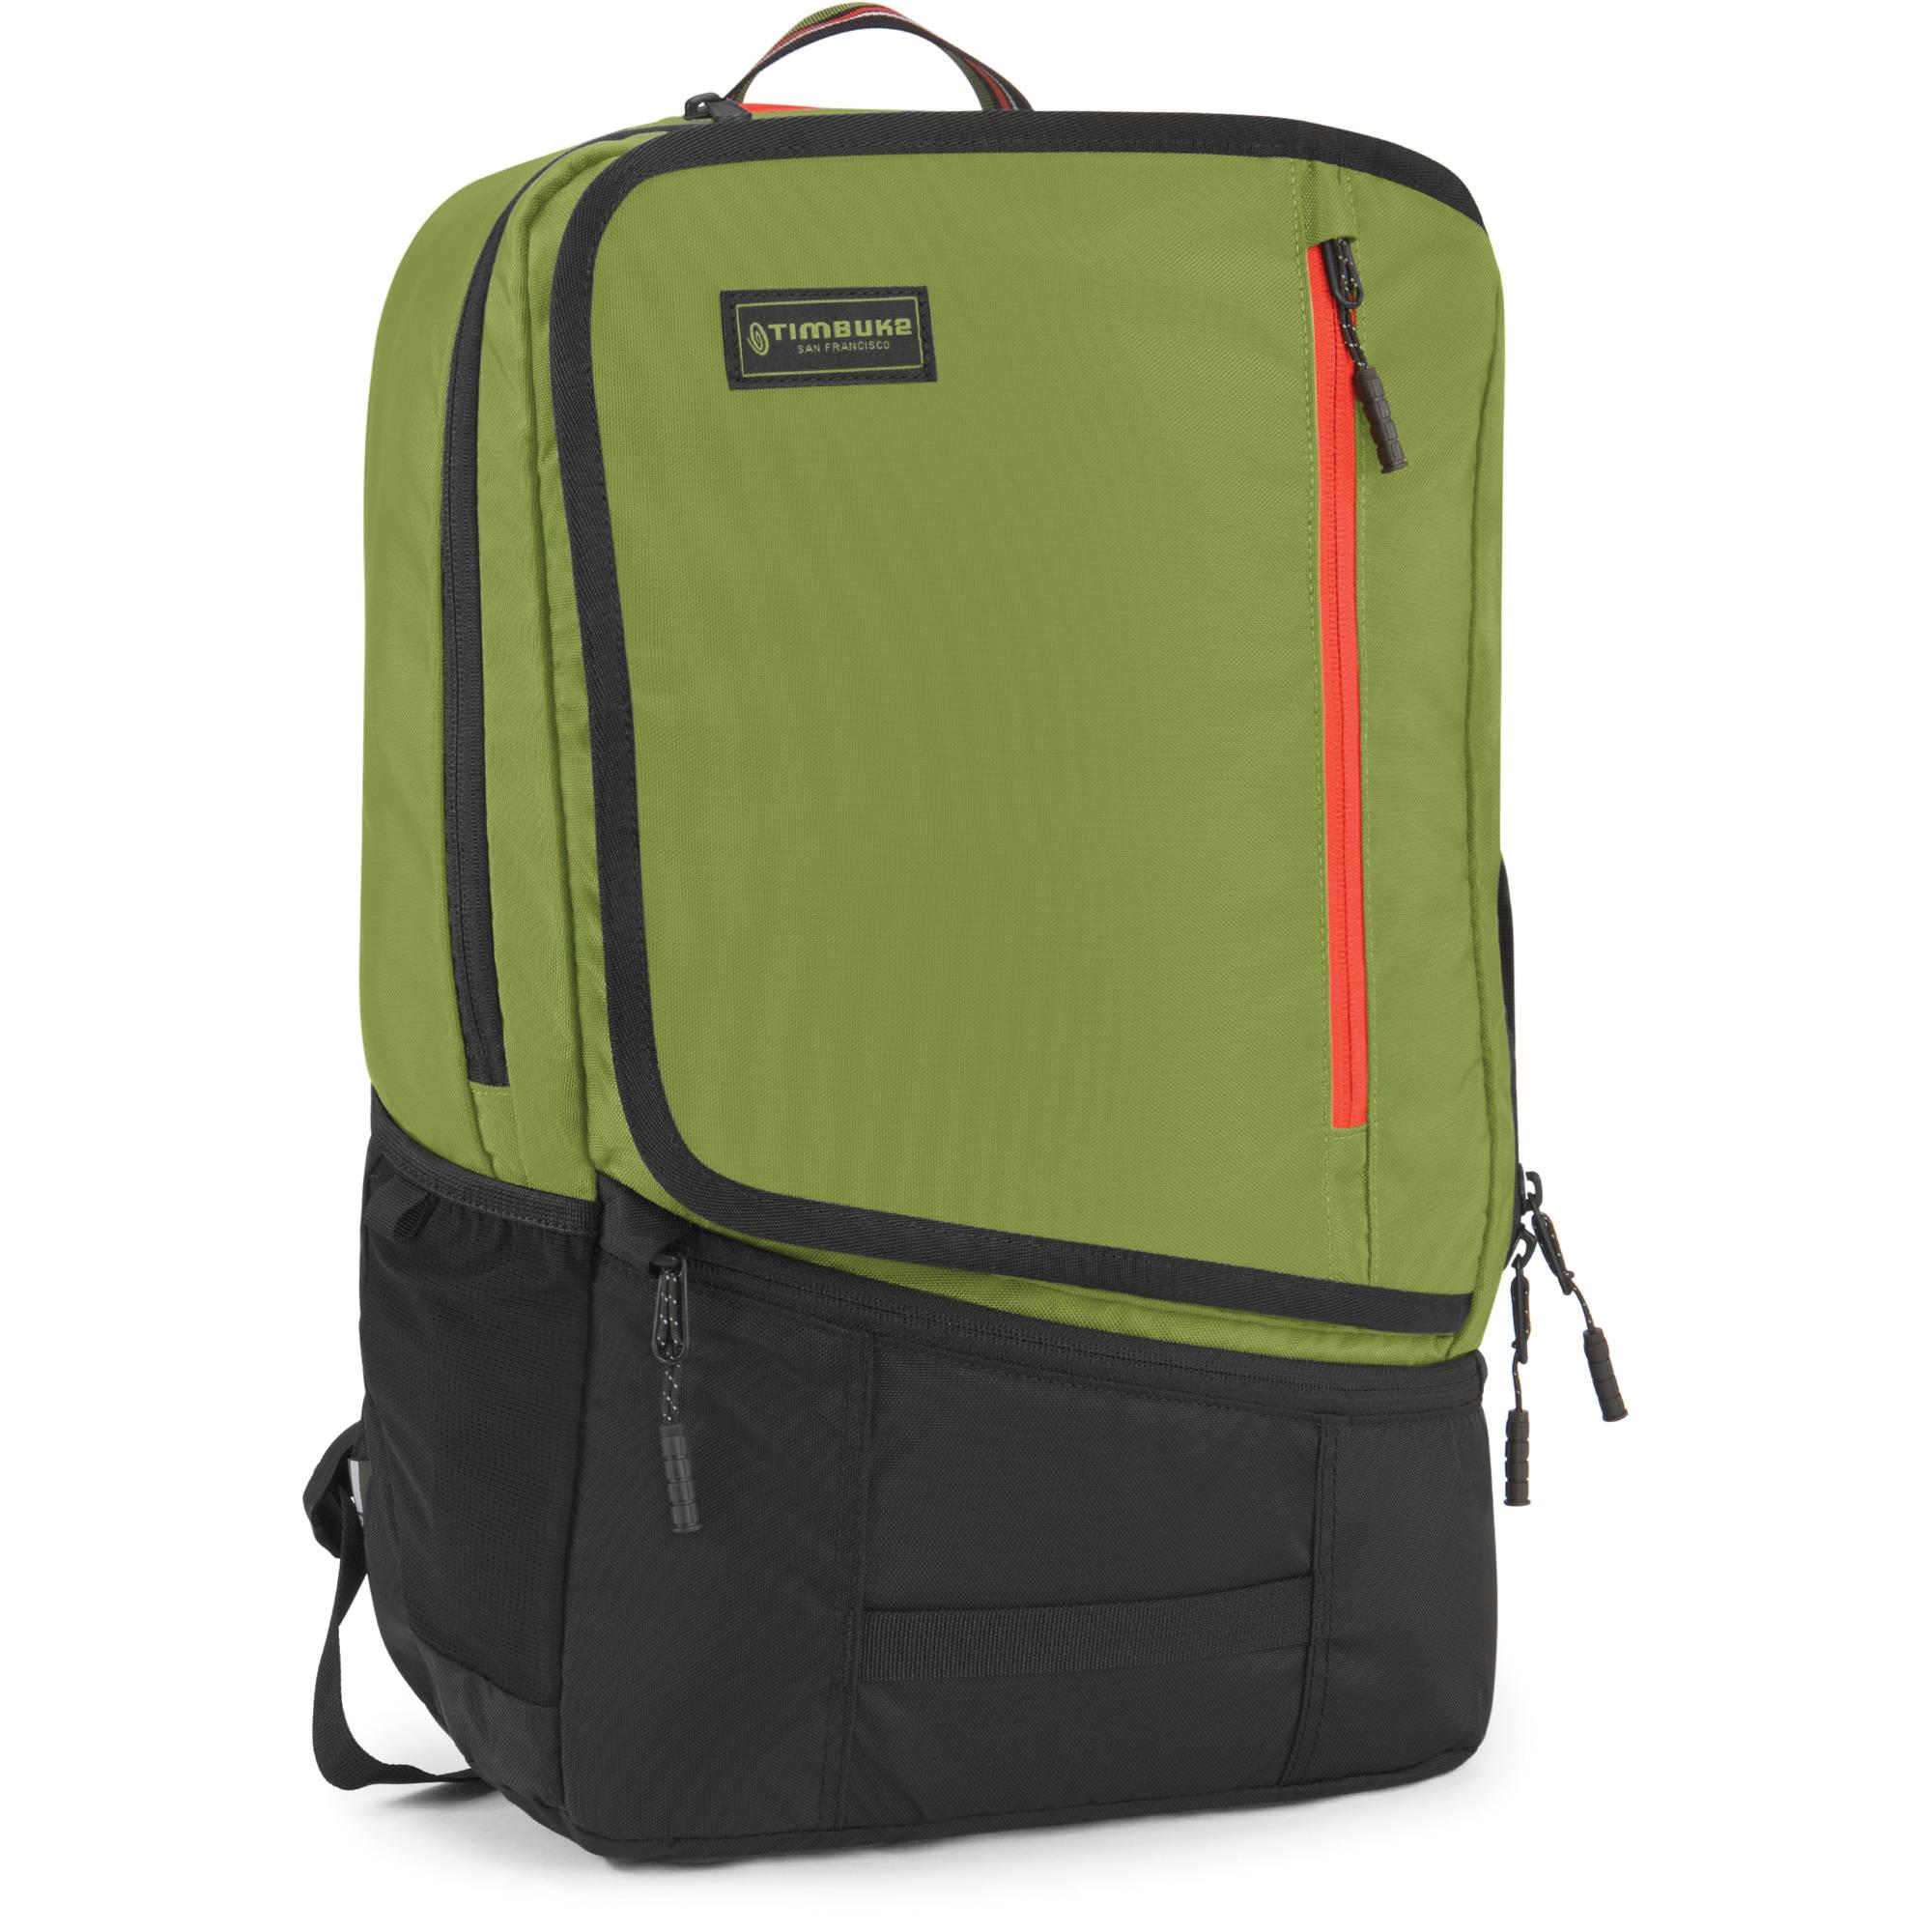 Timbuk2 Bags Q Martini Olive Surf Stripe - Backpacks